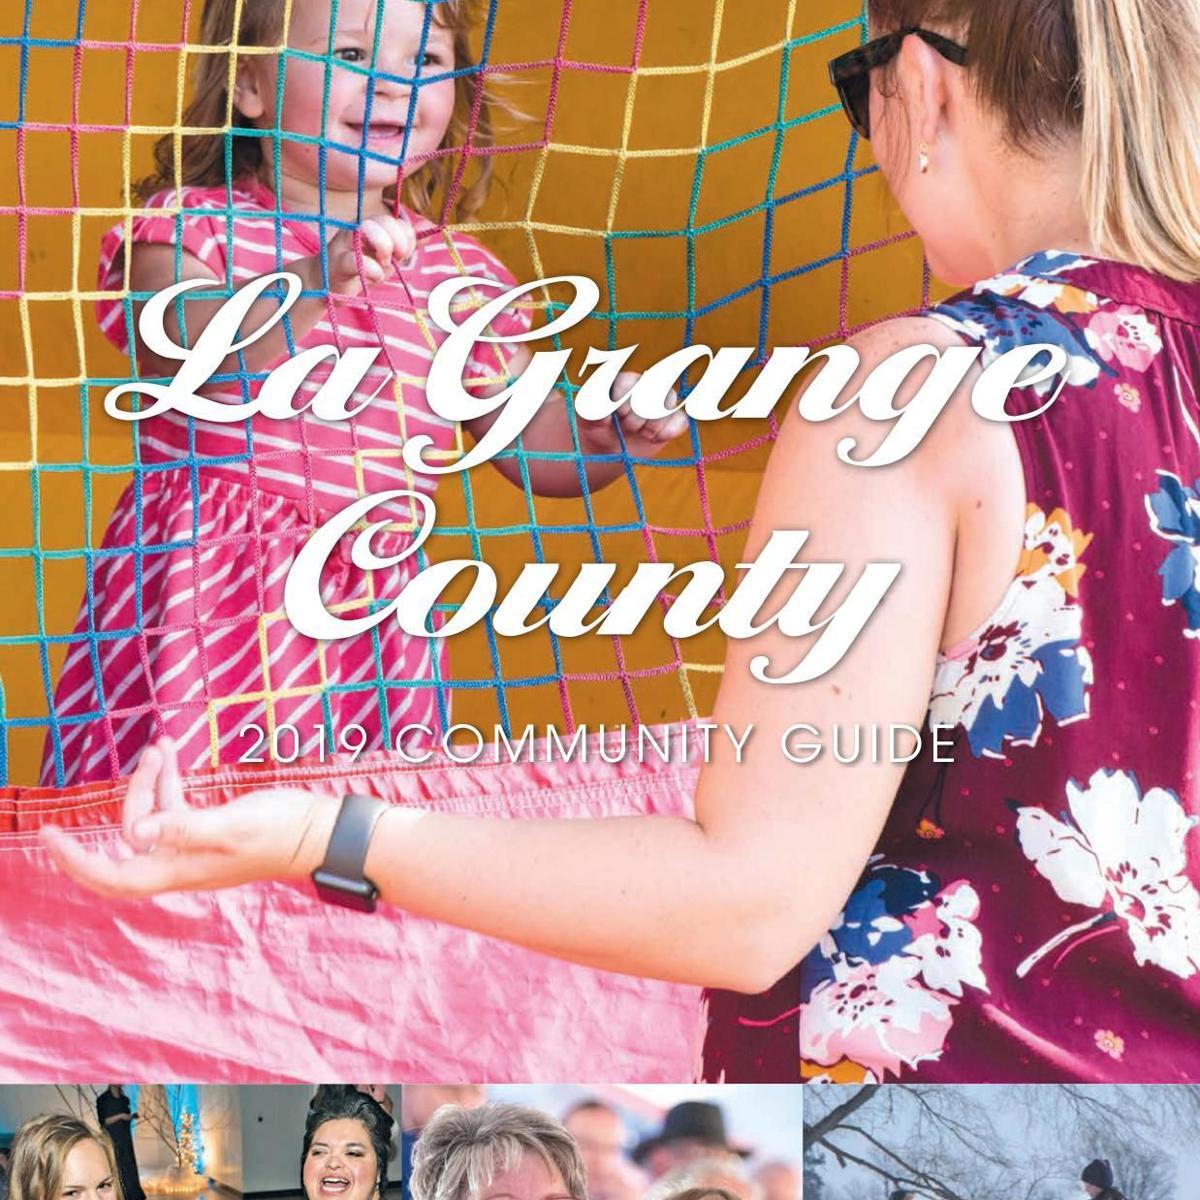 LaGrange County 2019 Community Guide